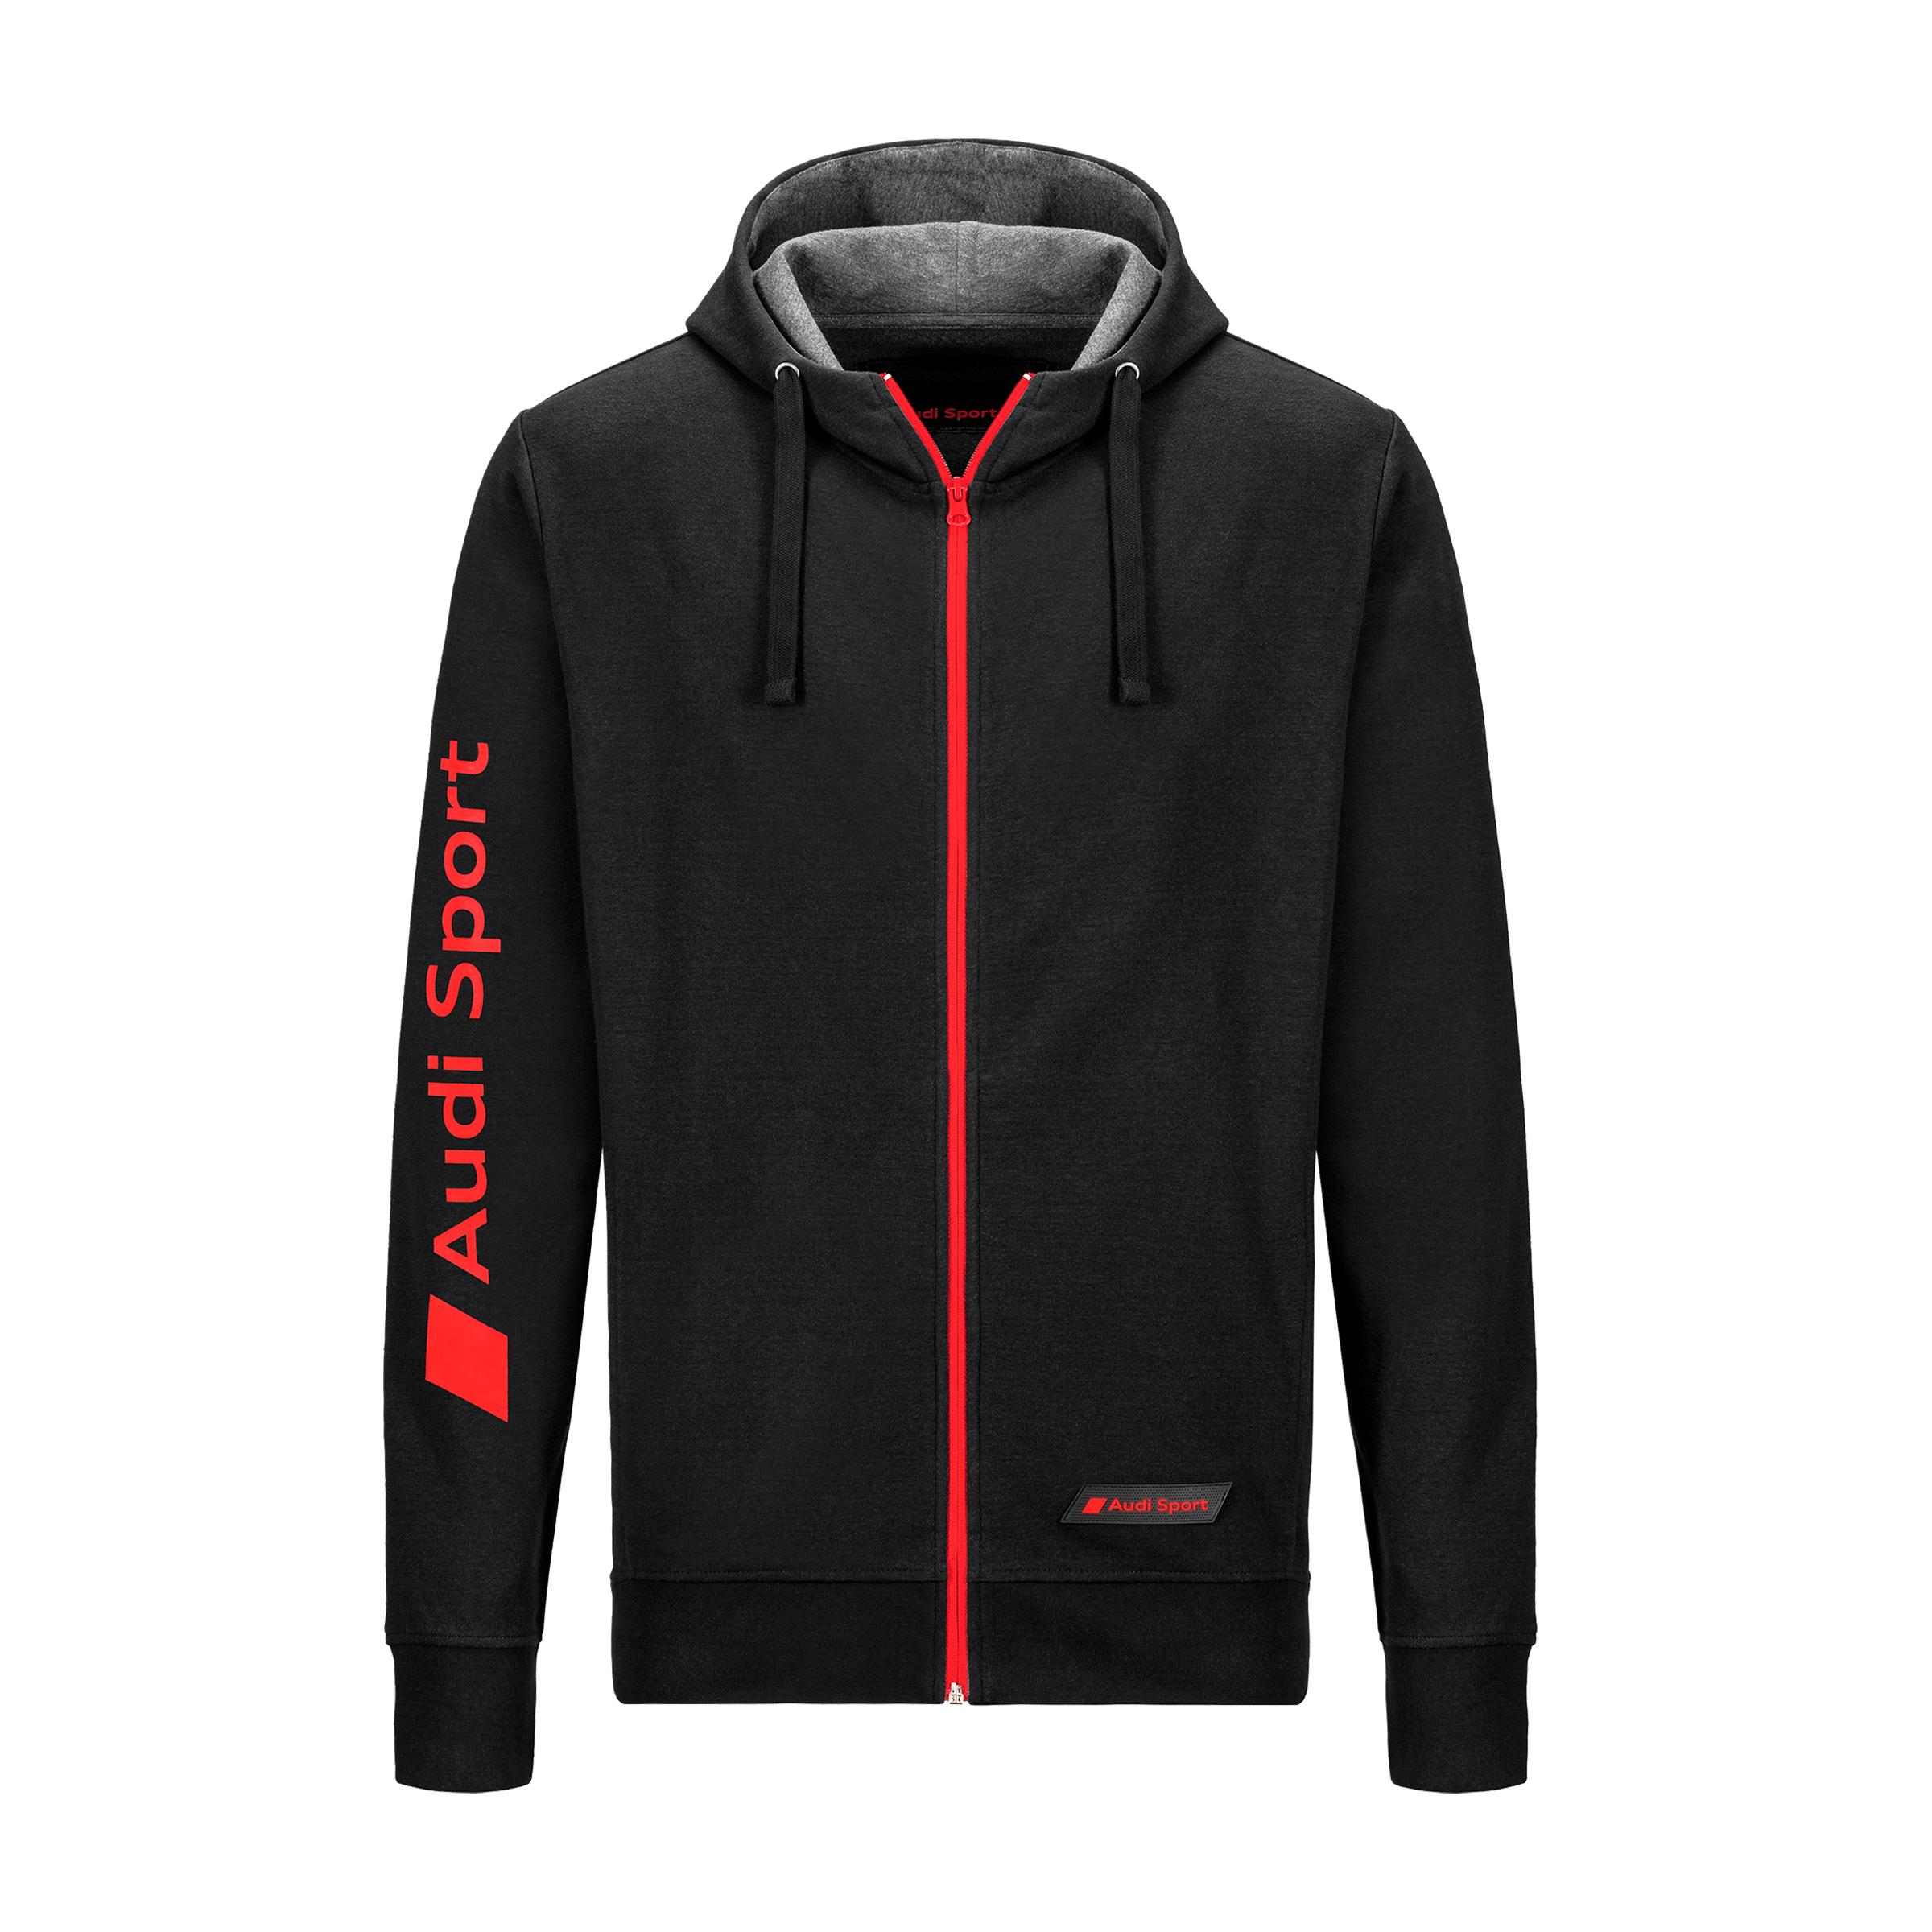 Audi Sport Sweatjacke Herren Größe S schwarz Kapuzen-Sweatshirt